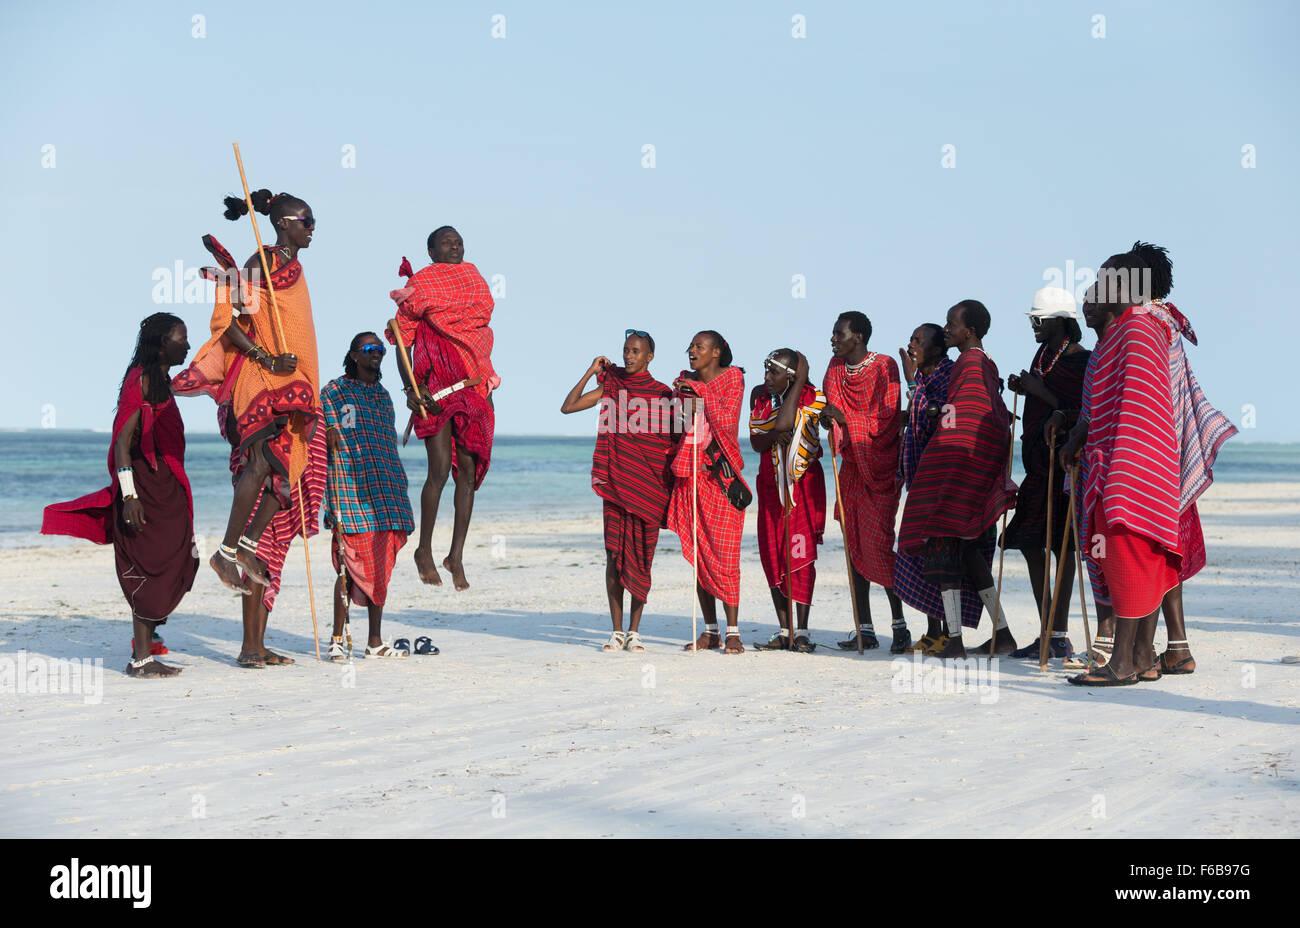 Maasai tribesmen perform the jumping dance, or adumu on the beach on the island of Unguja in the Zanzibar archipelago. - Stock Image